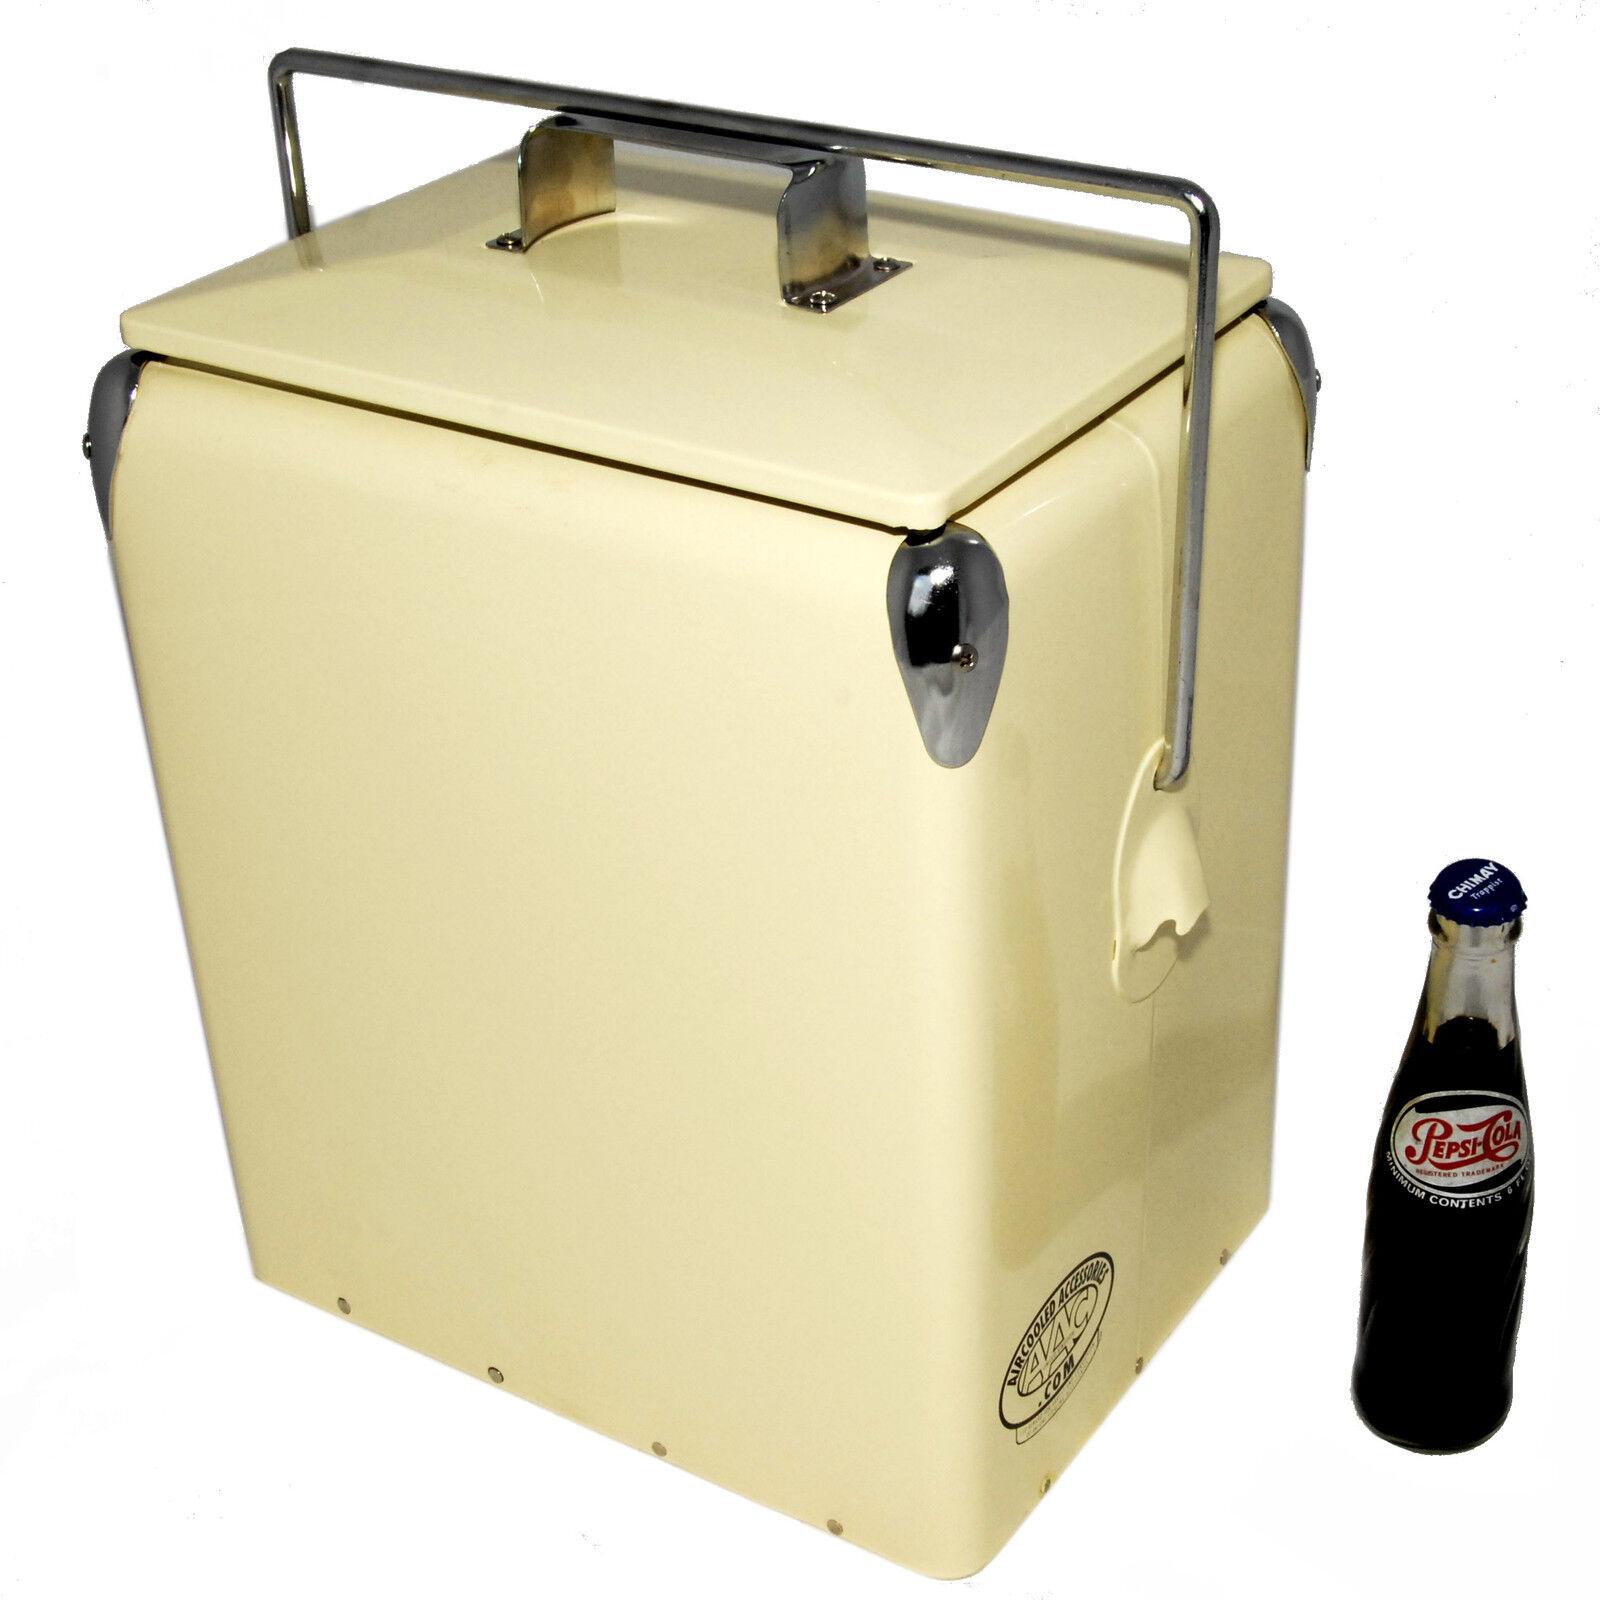 Retro Cool box PLAIN CREAM Cooler 17L Vintage Coolbox mariage present AAC079